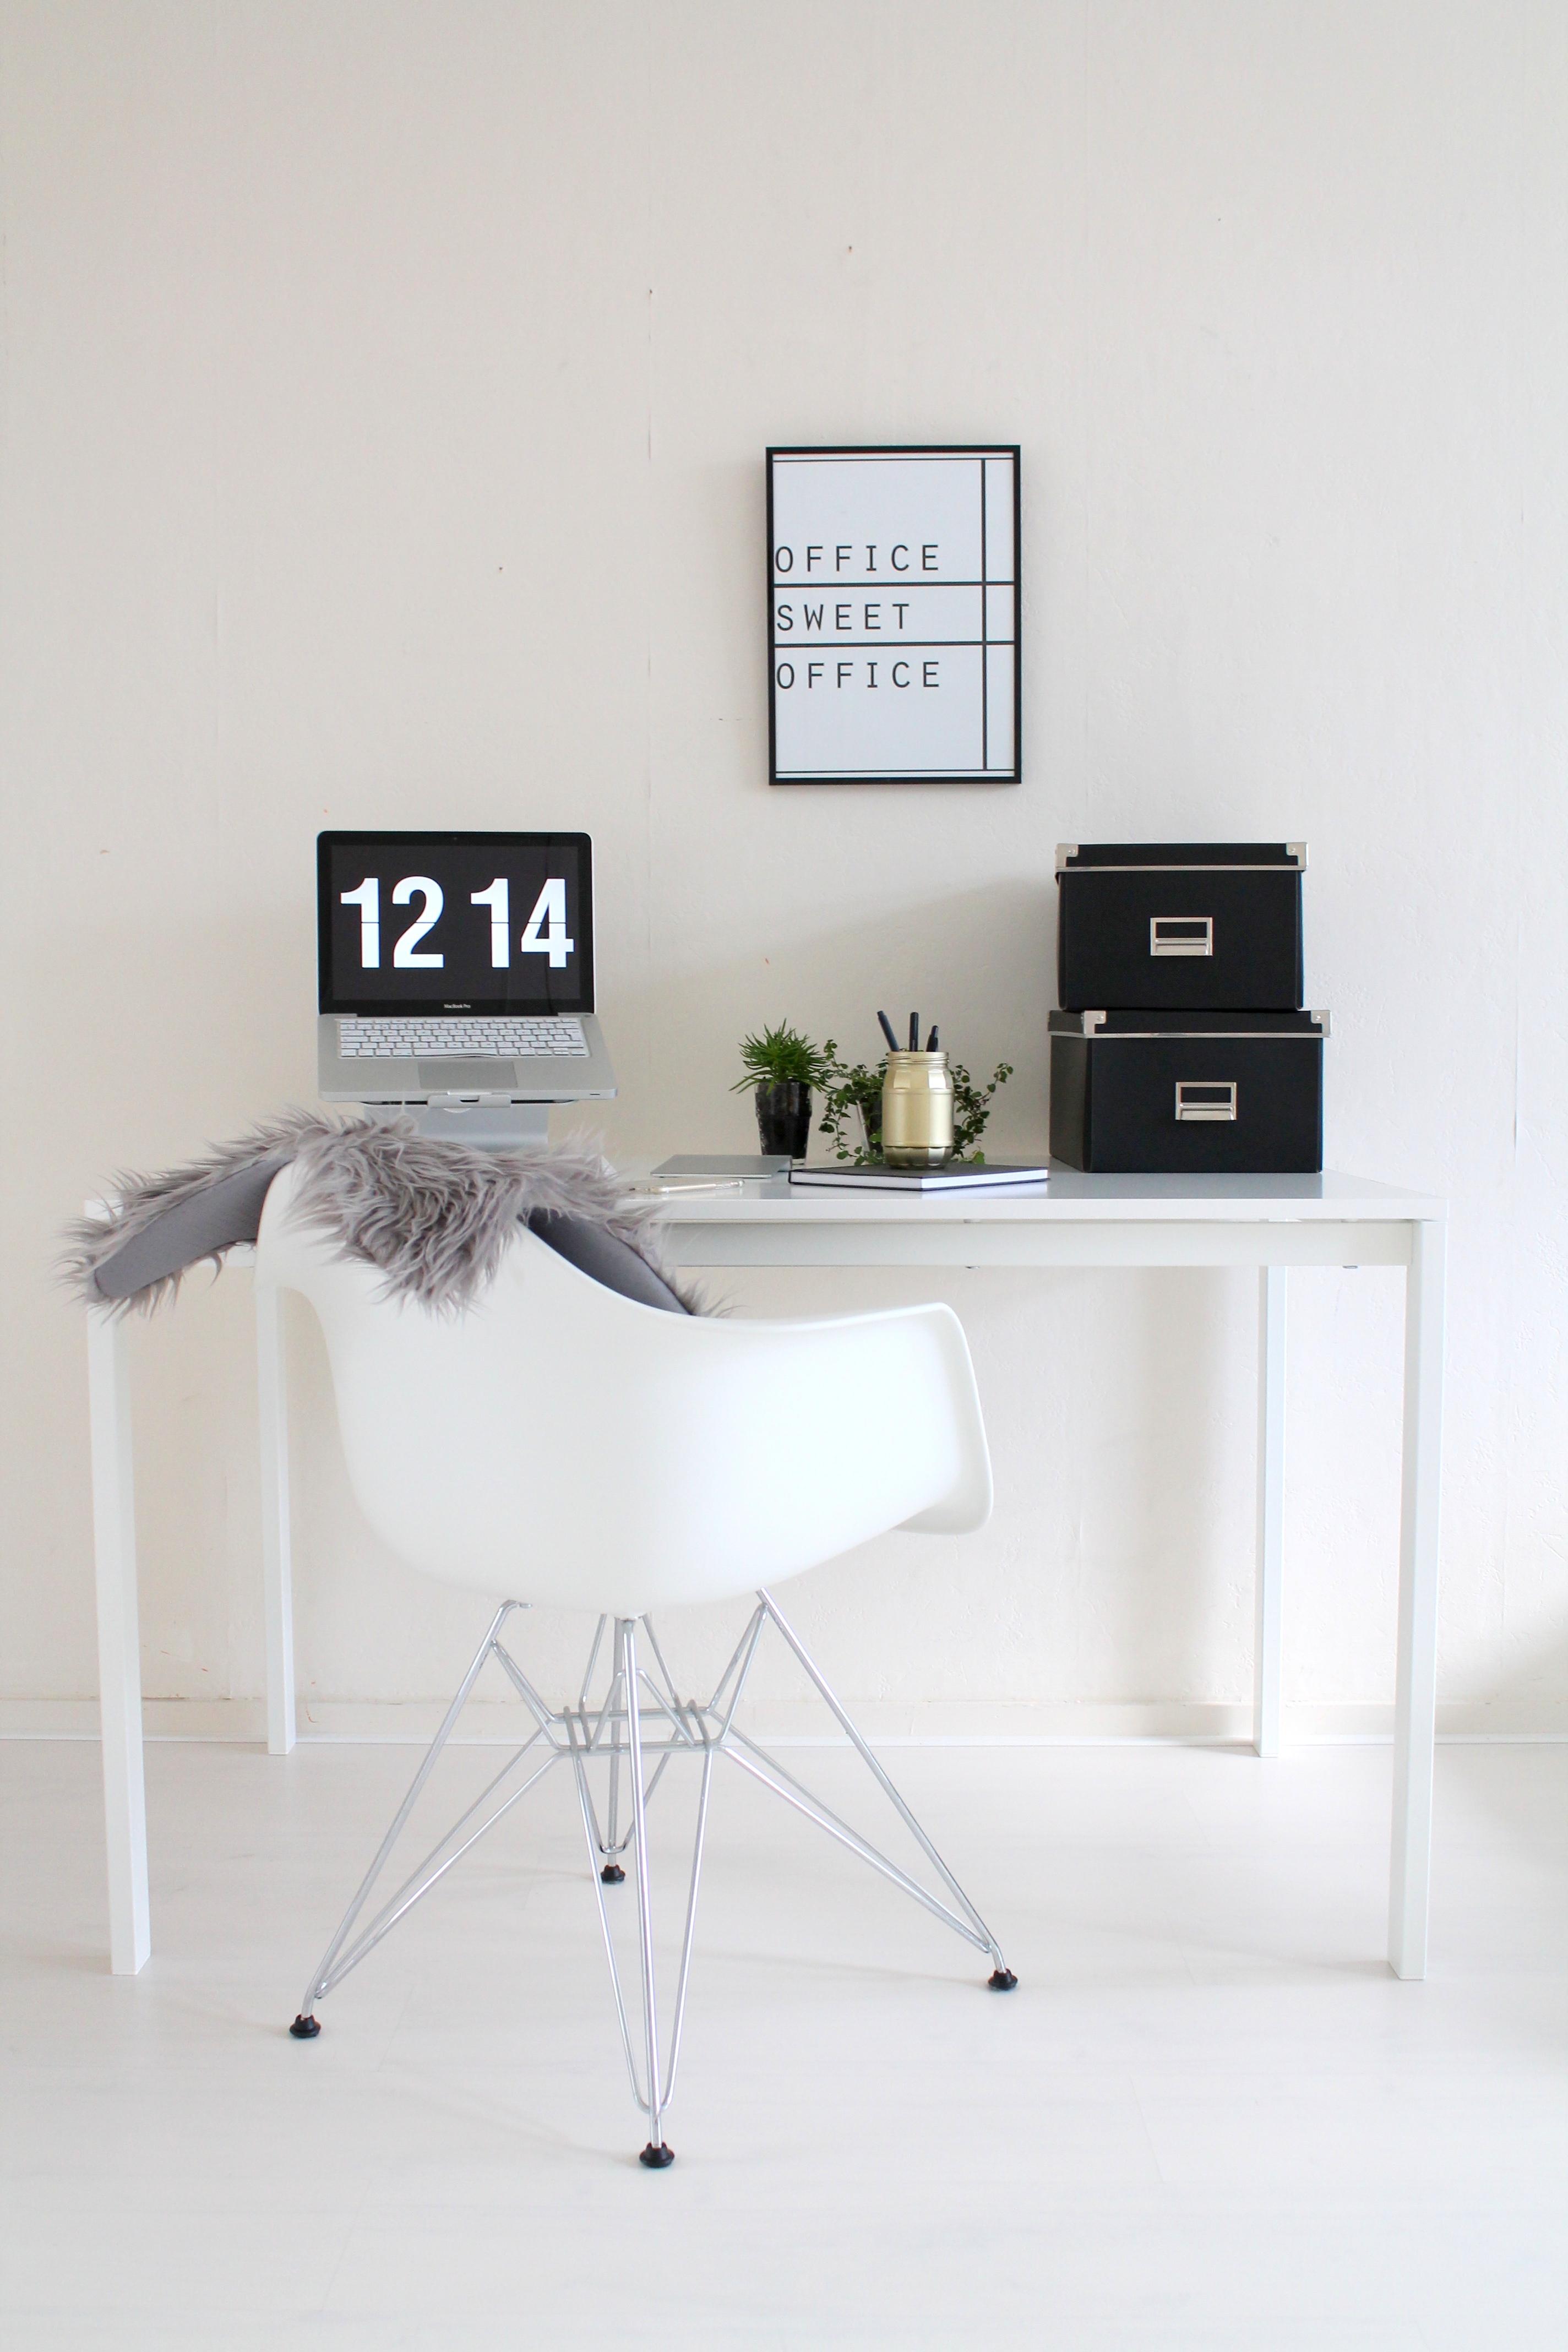 Klein Ikea Bureau.Shoplog En Stylingtip Mijn Nieuwe Werkplek Donebymyself